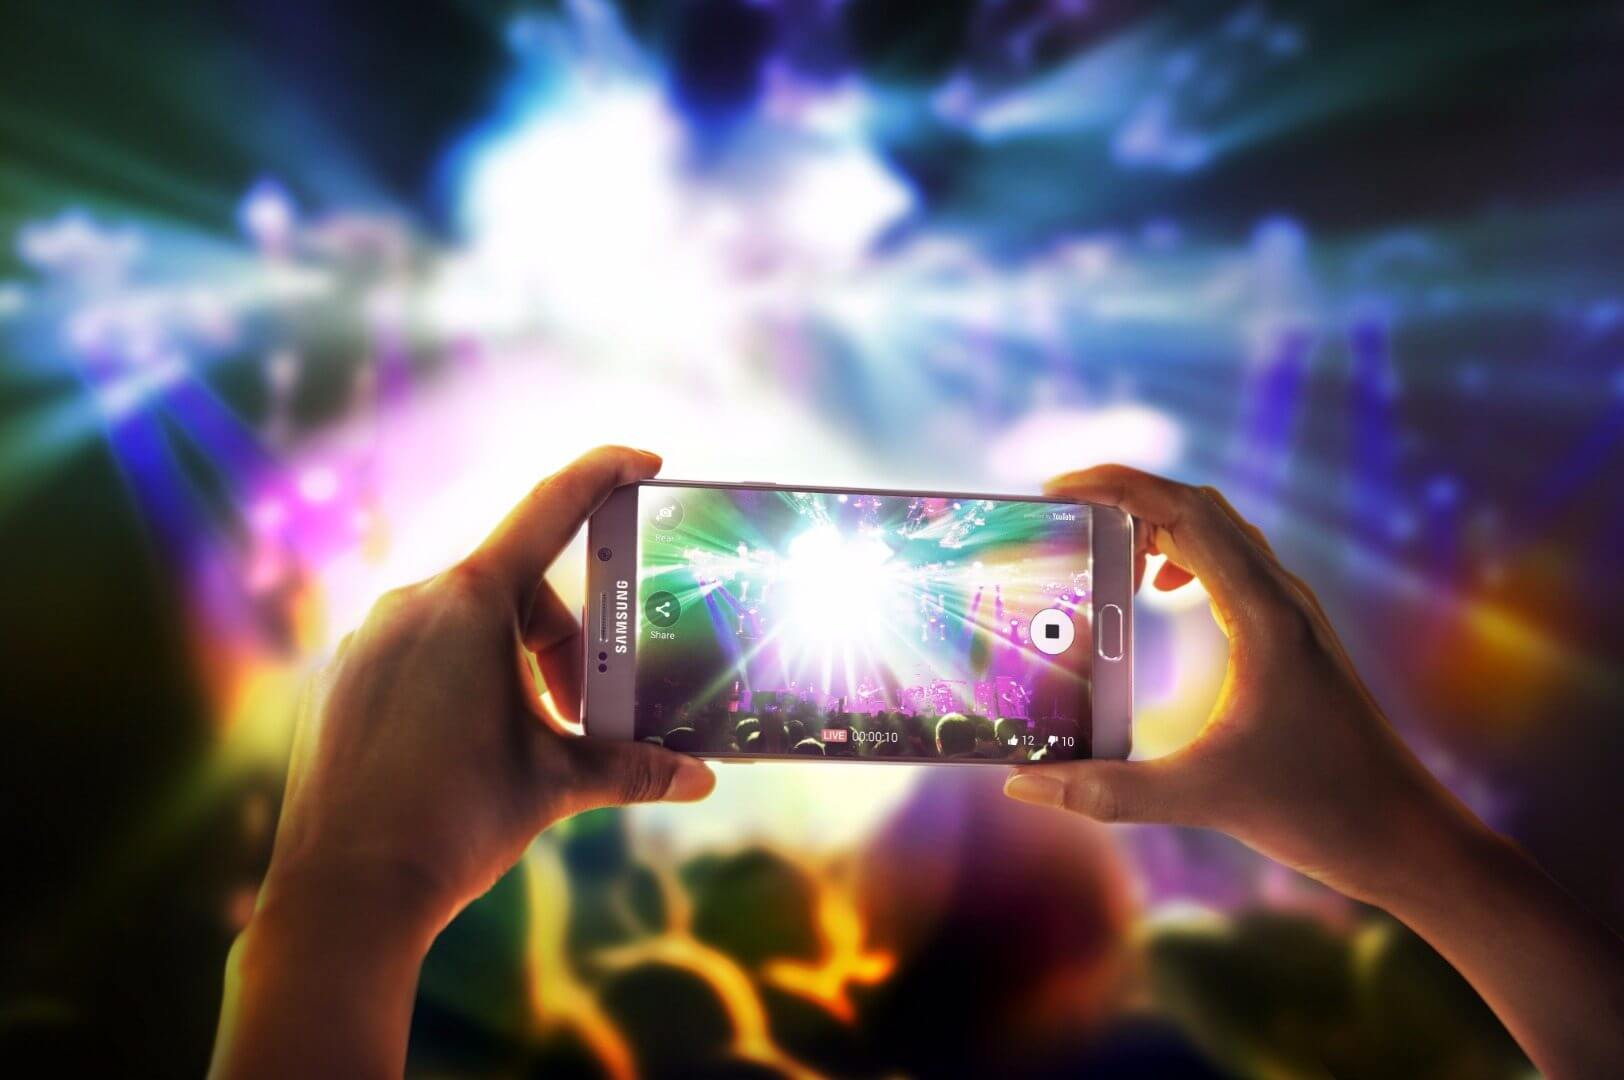 samsung galaxy note 5 capa - Galaxy Note 6 tem data de lançamento confirmada